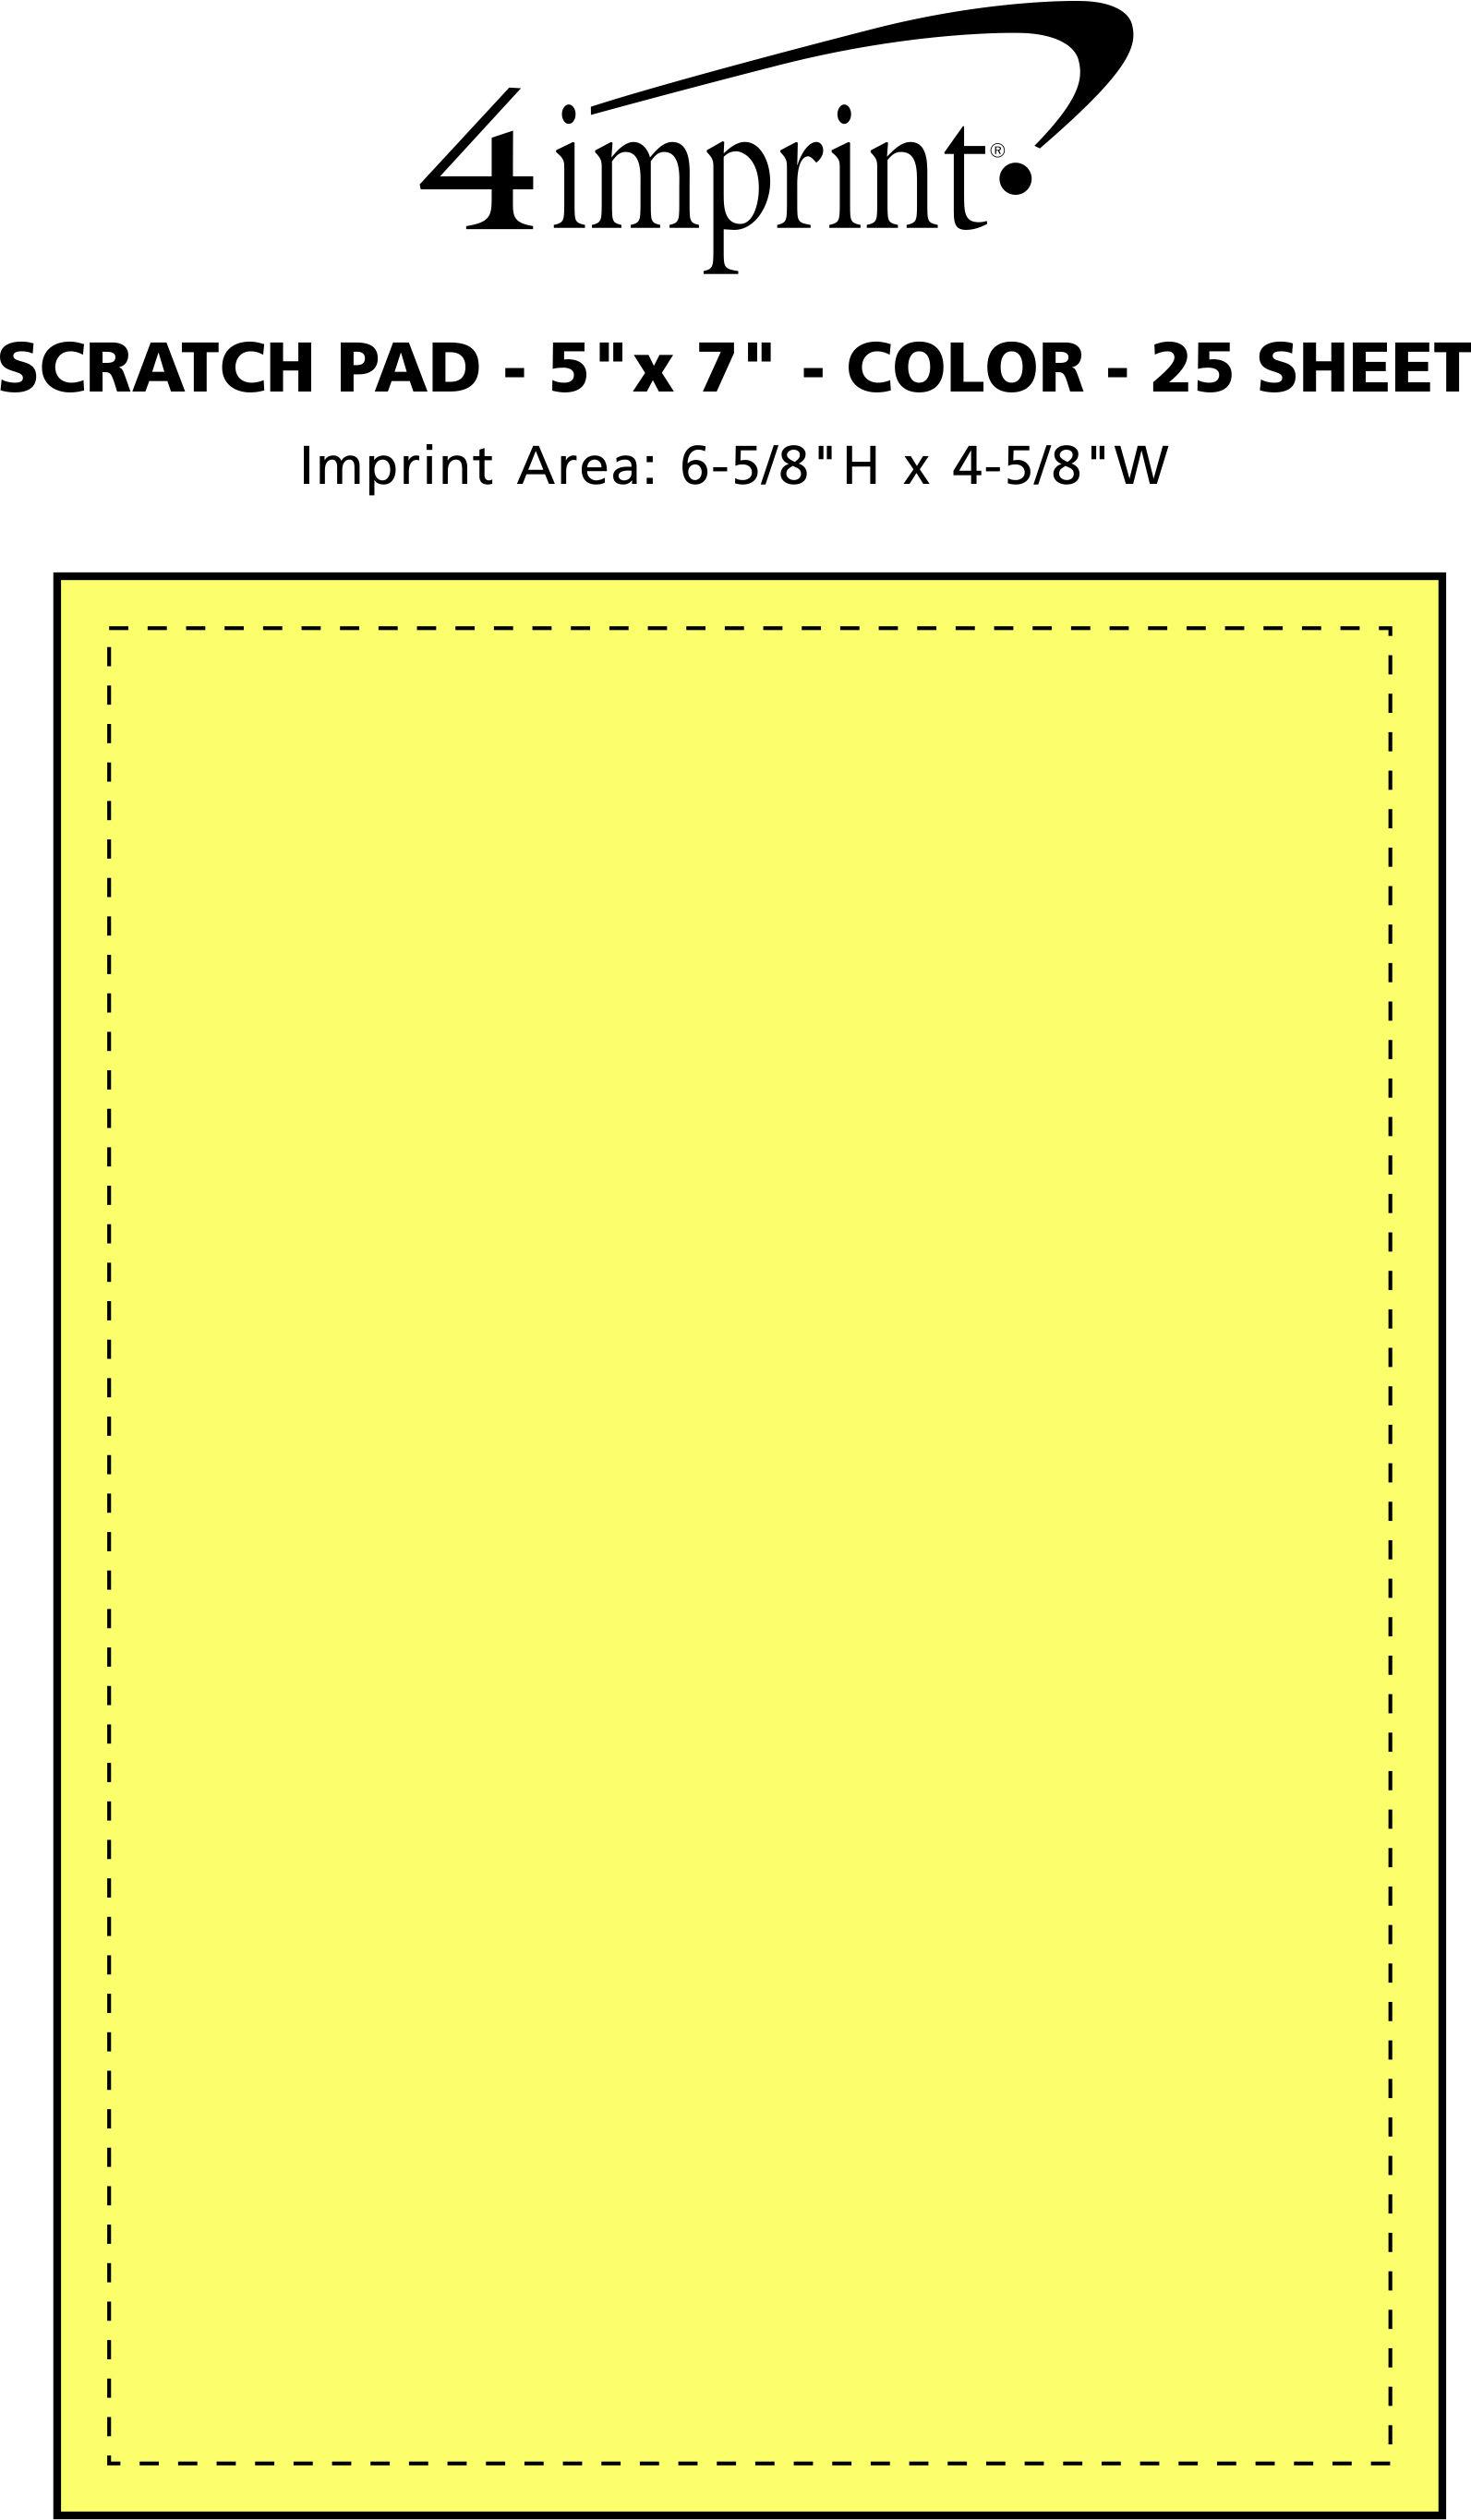 "Imprint Area of Scratch Pad - 7"" x 5"" - Color - 25 Sheet"